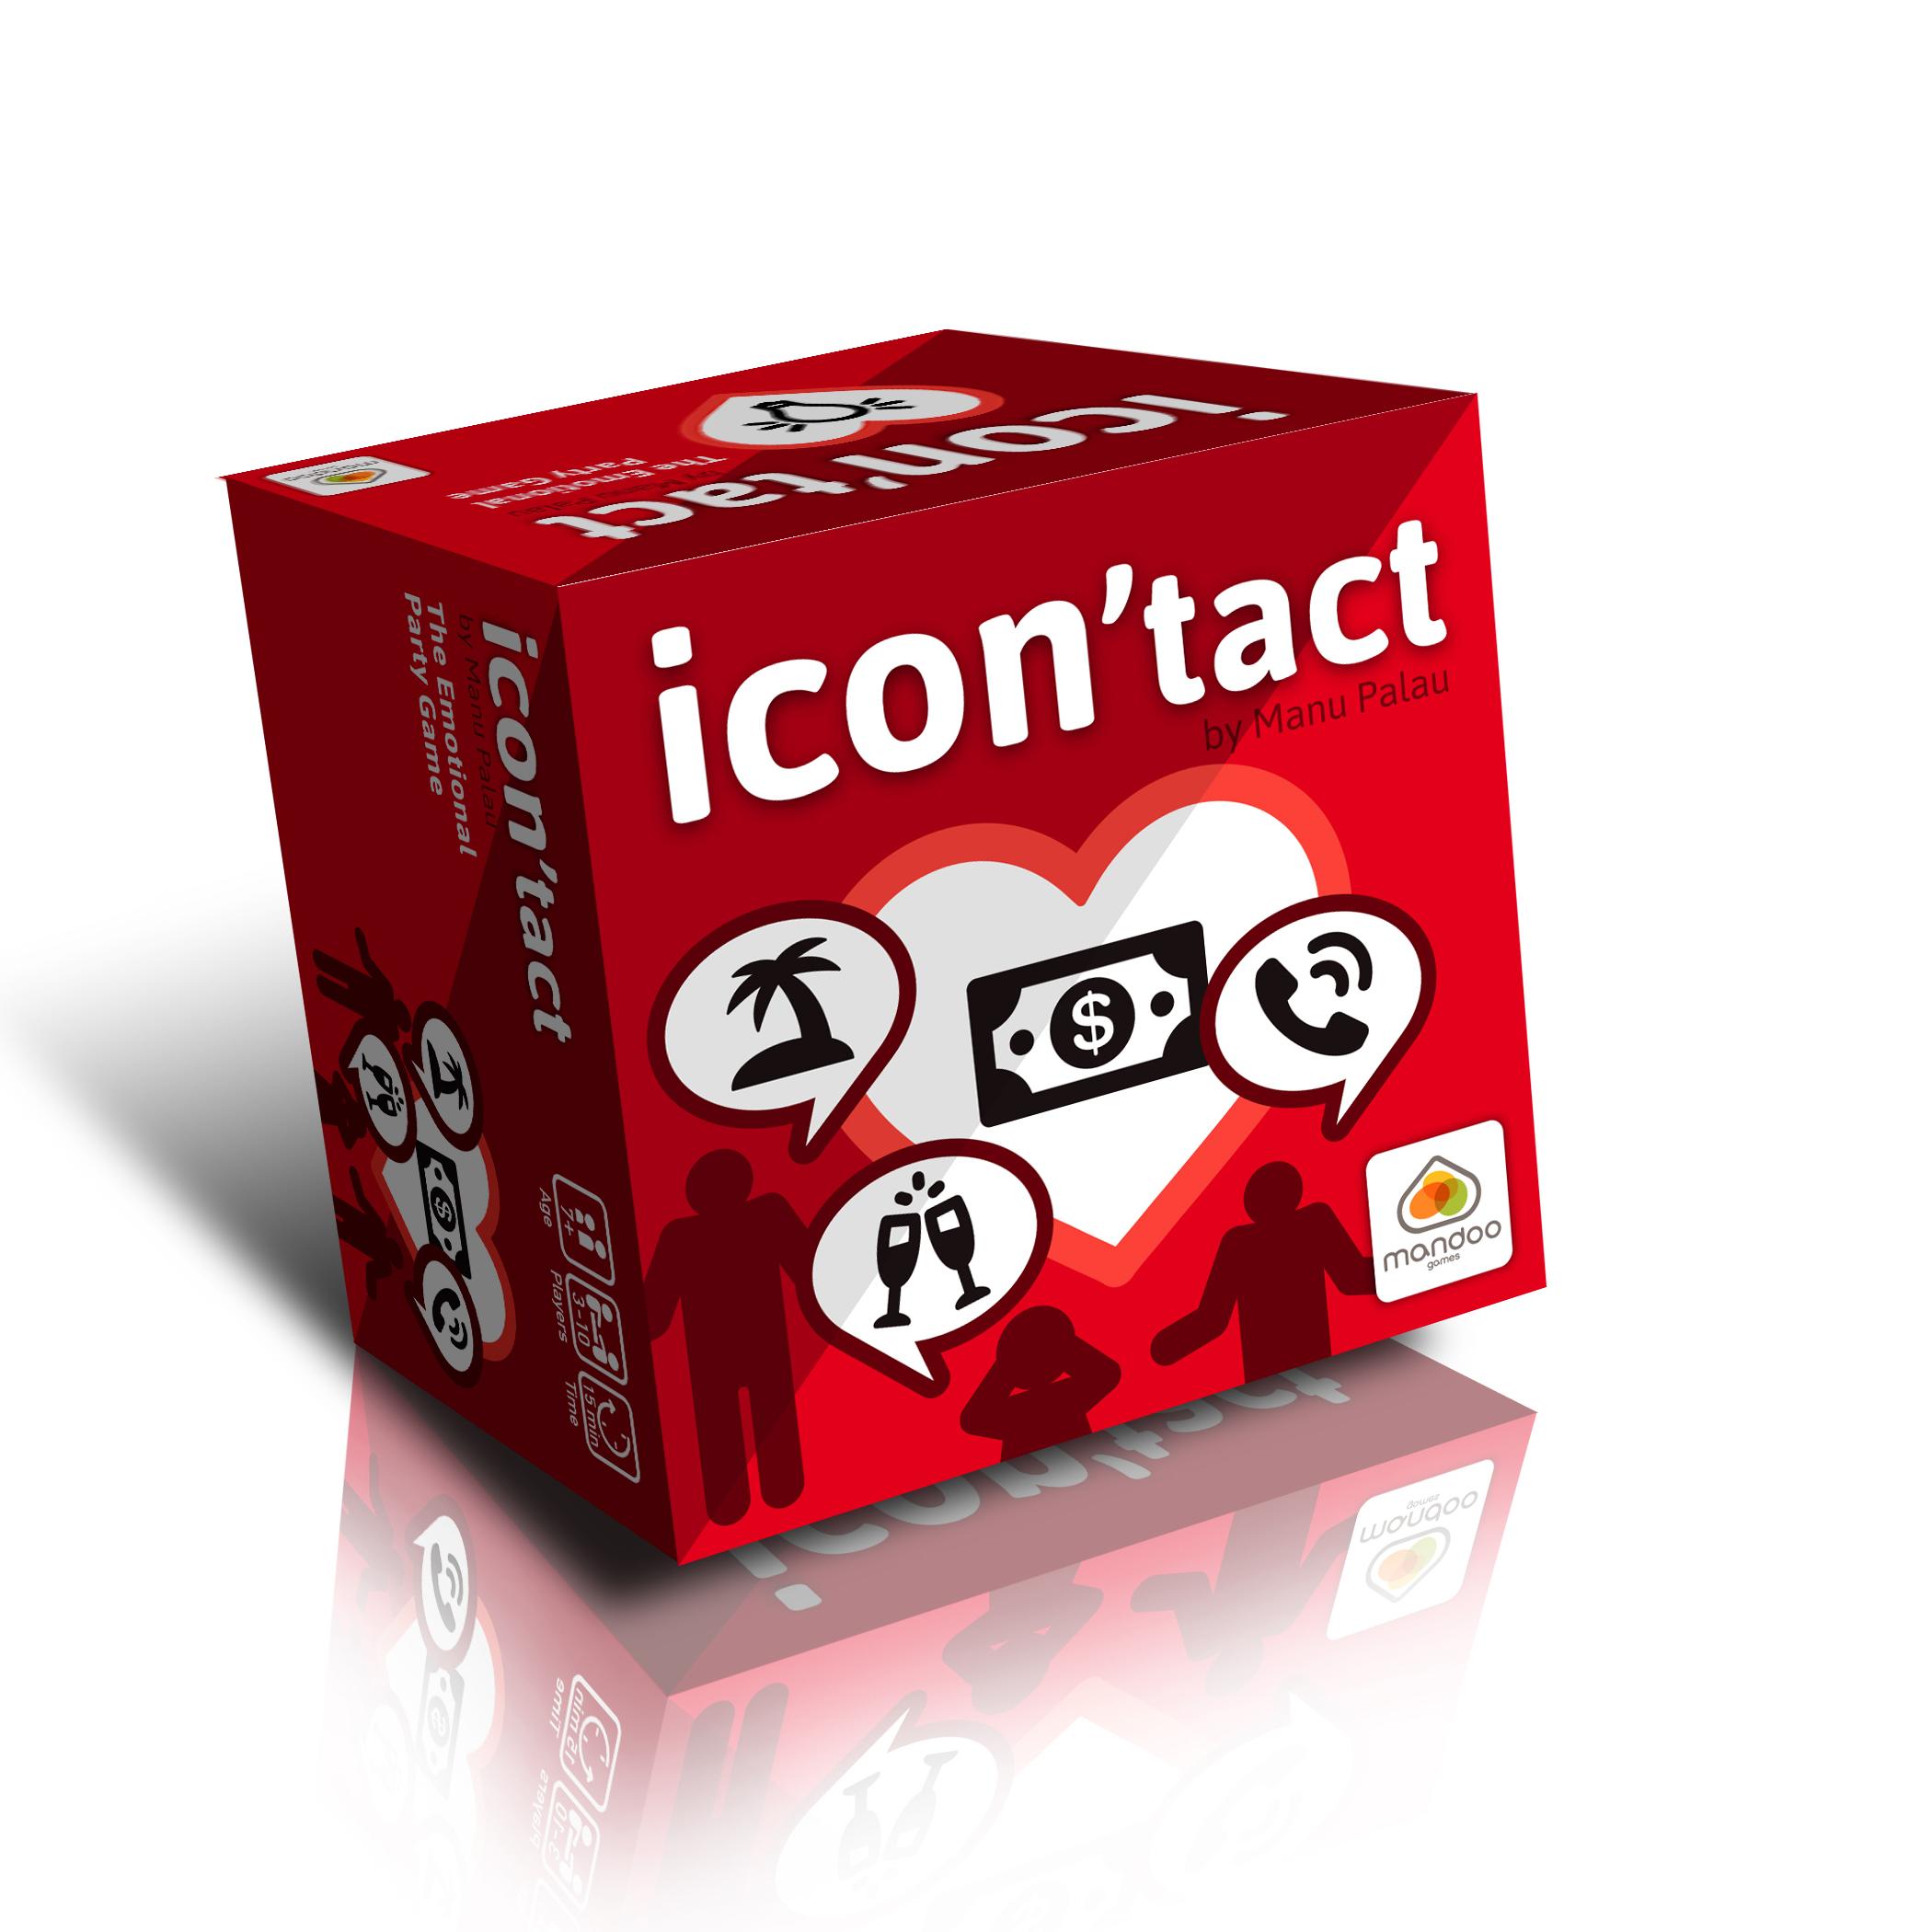 Ikonikus (icon'tact)